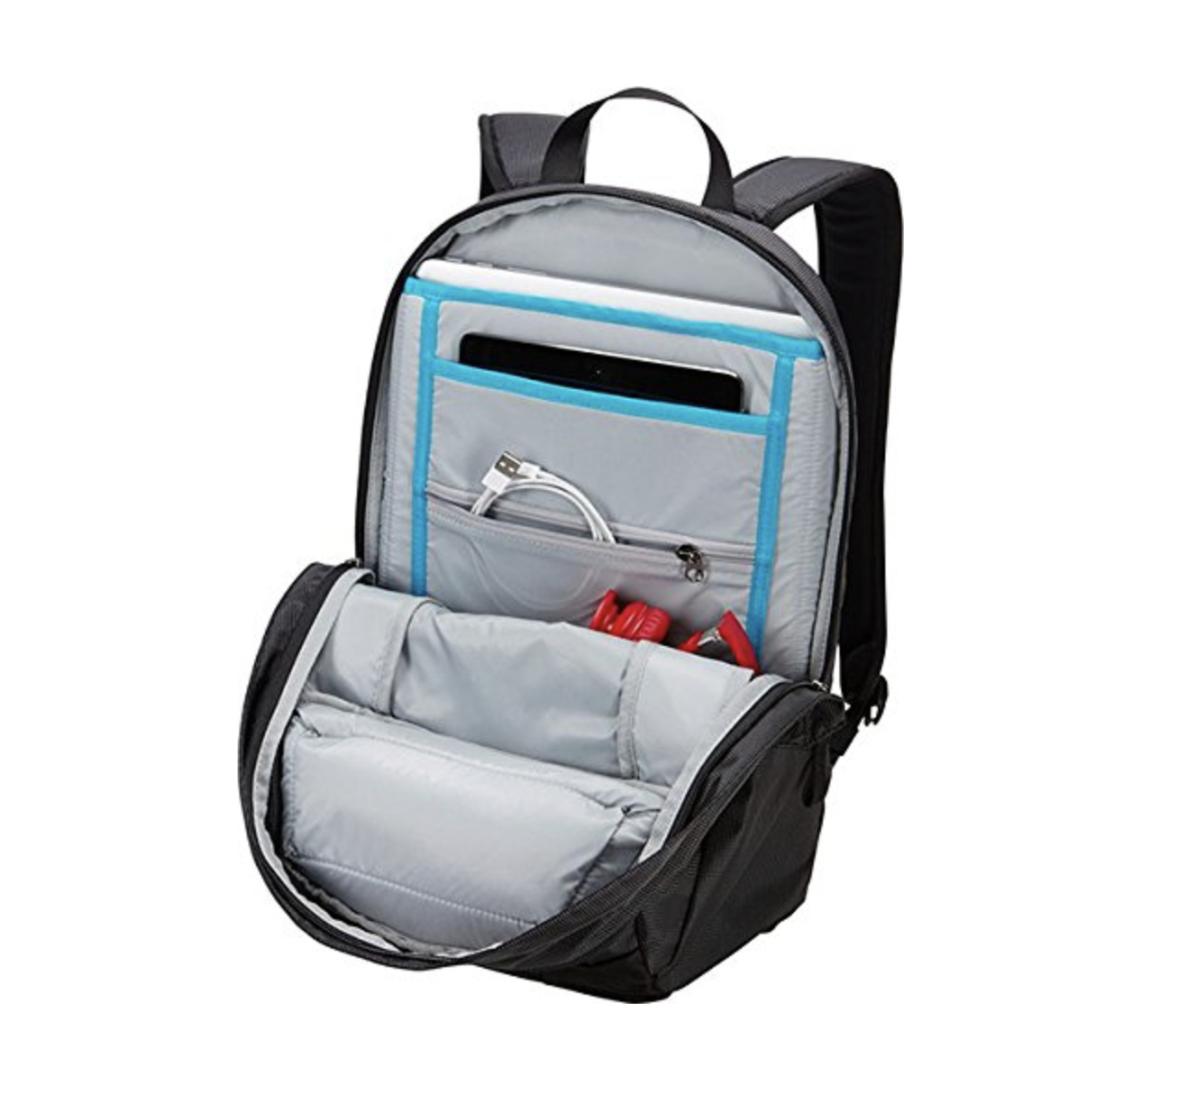 f:id:thebackpack:20190830194330p:plain